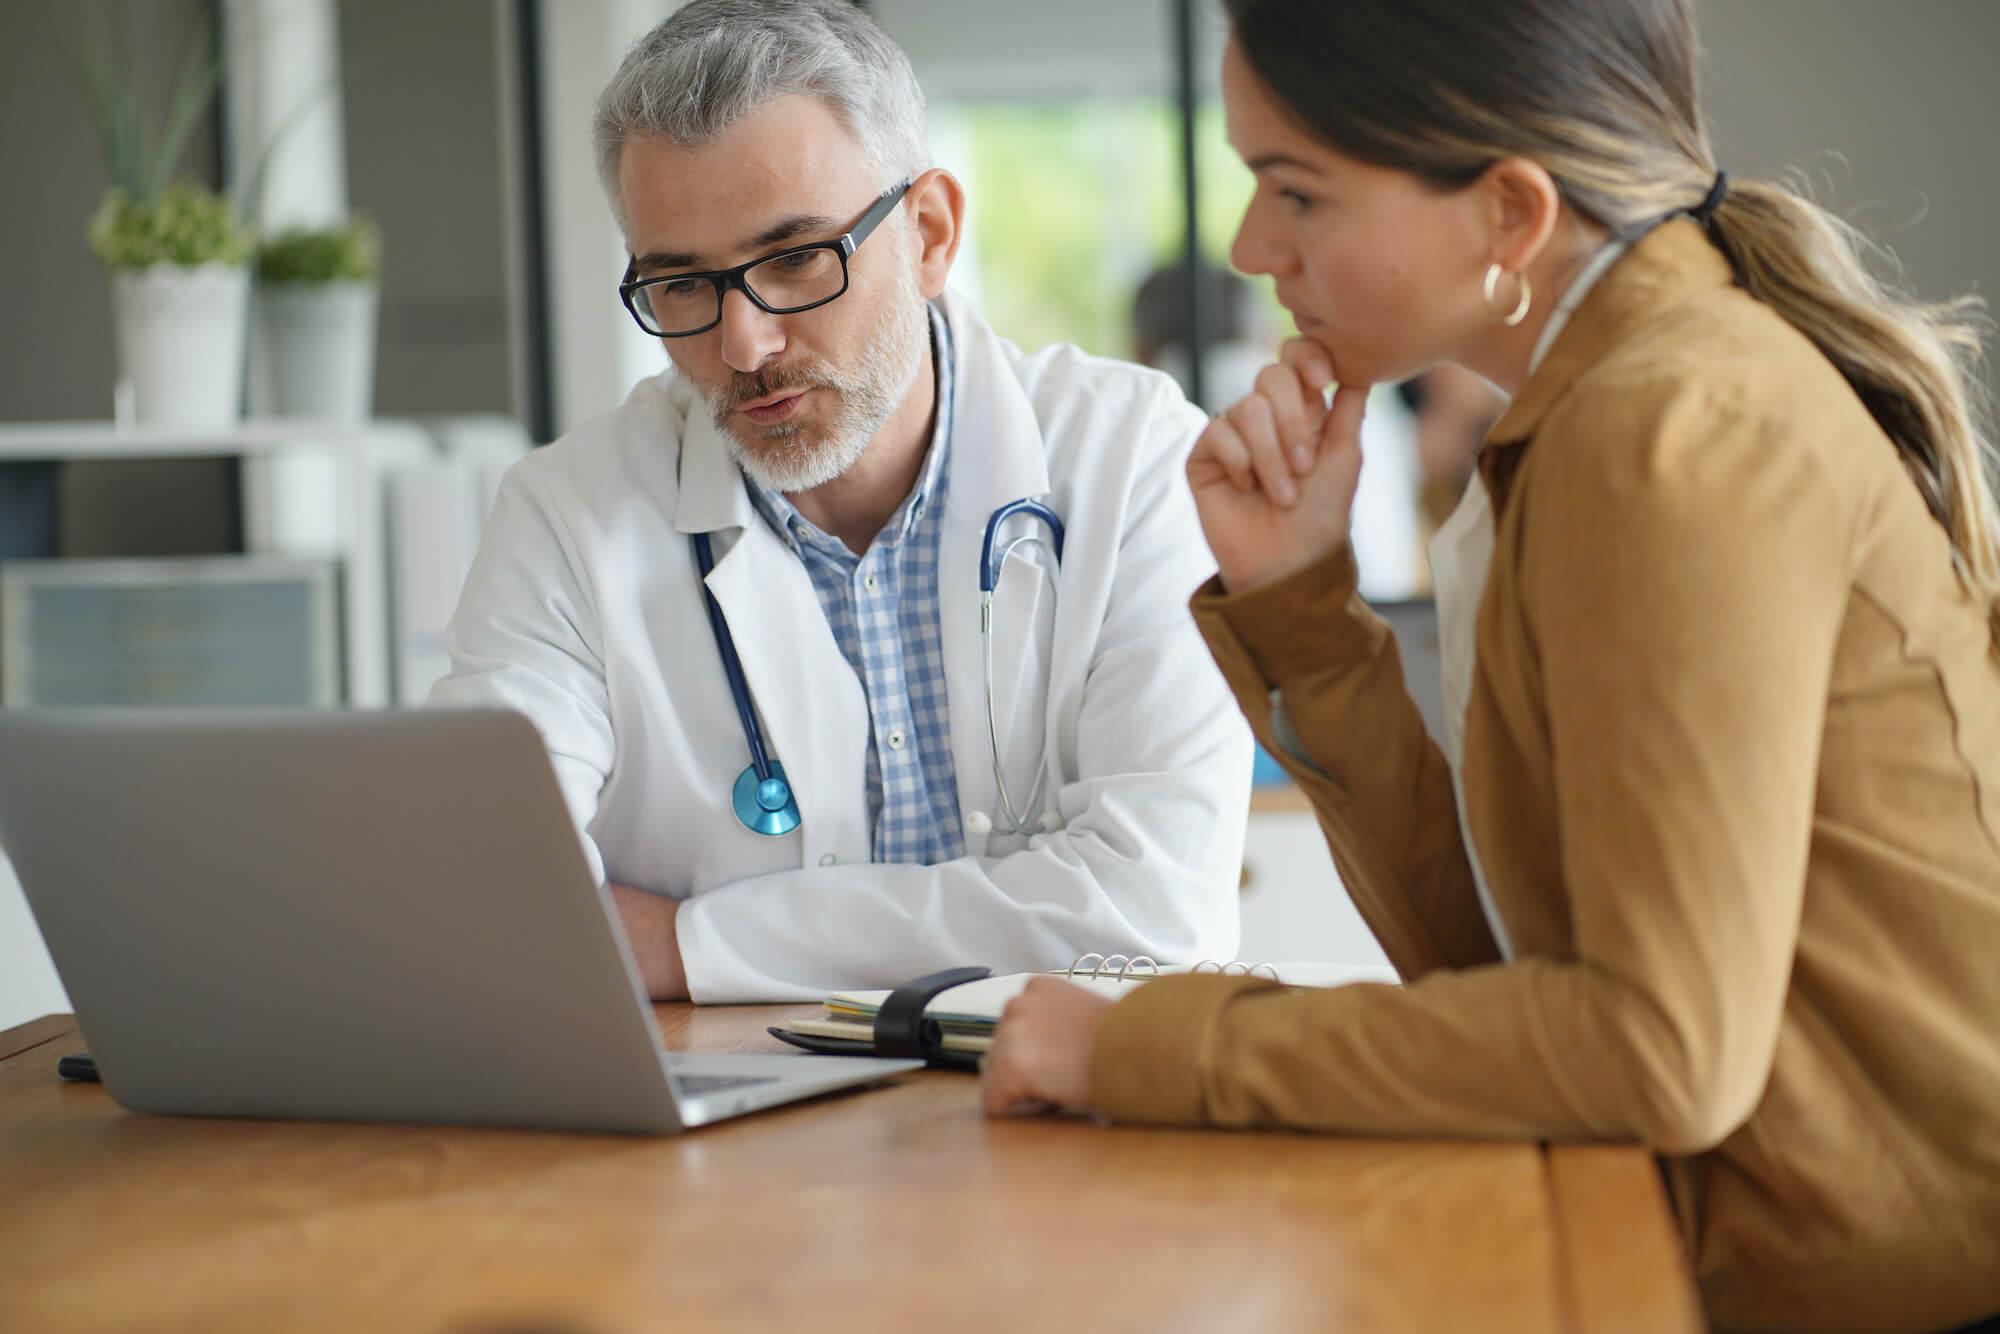 doctor reviewing patient